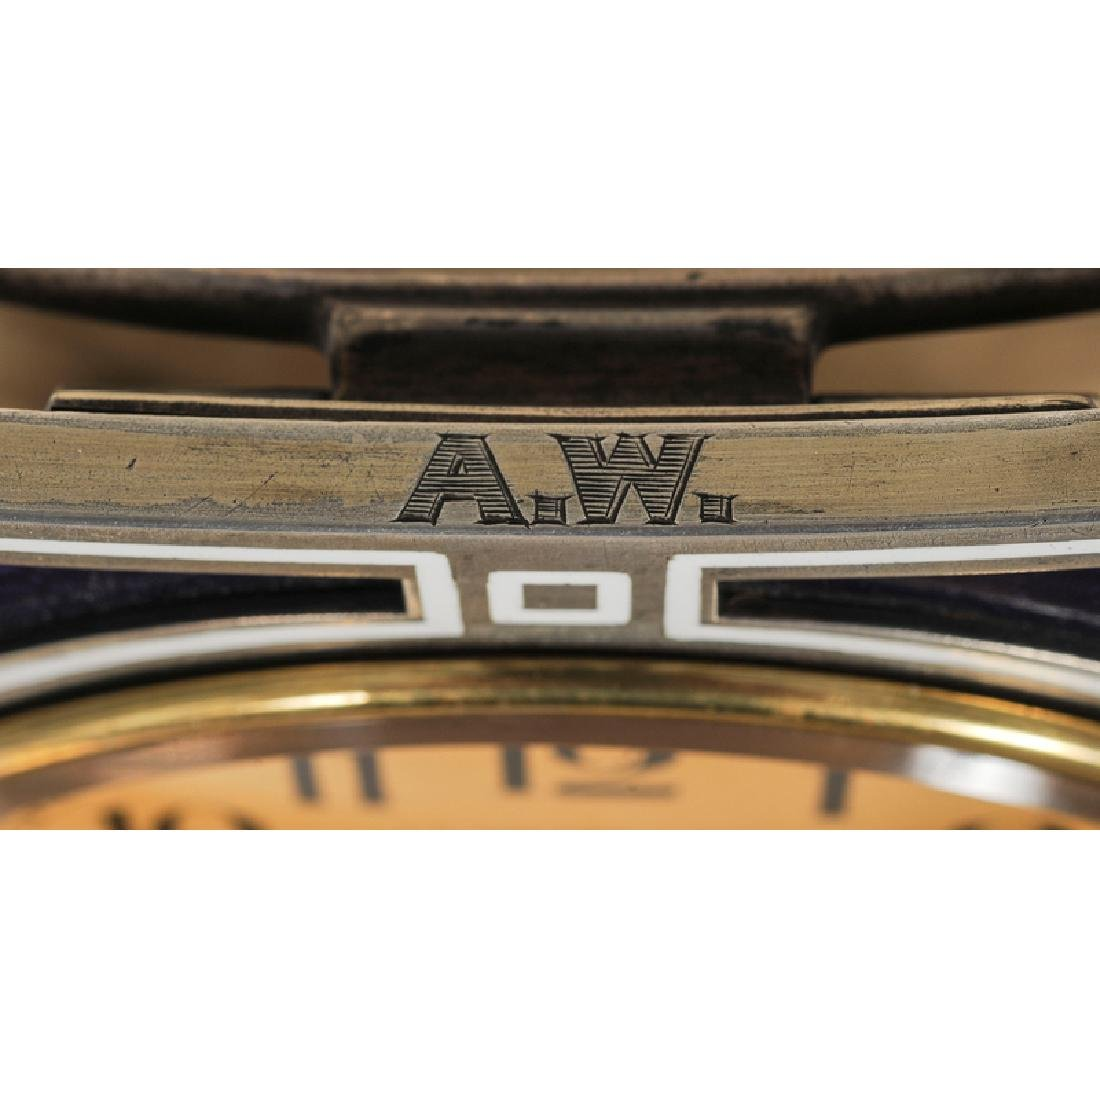 J. E. Caldwell Silver and Enamel Desk Clock - 2